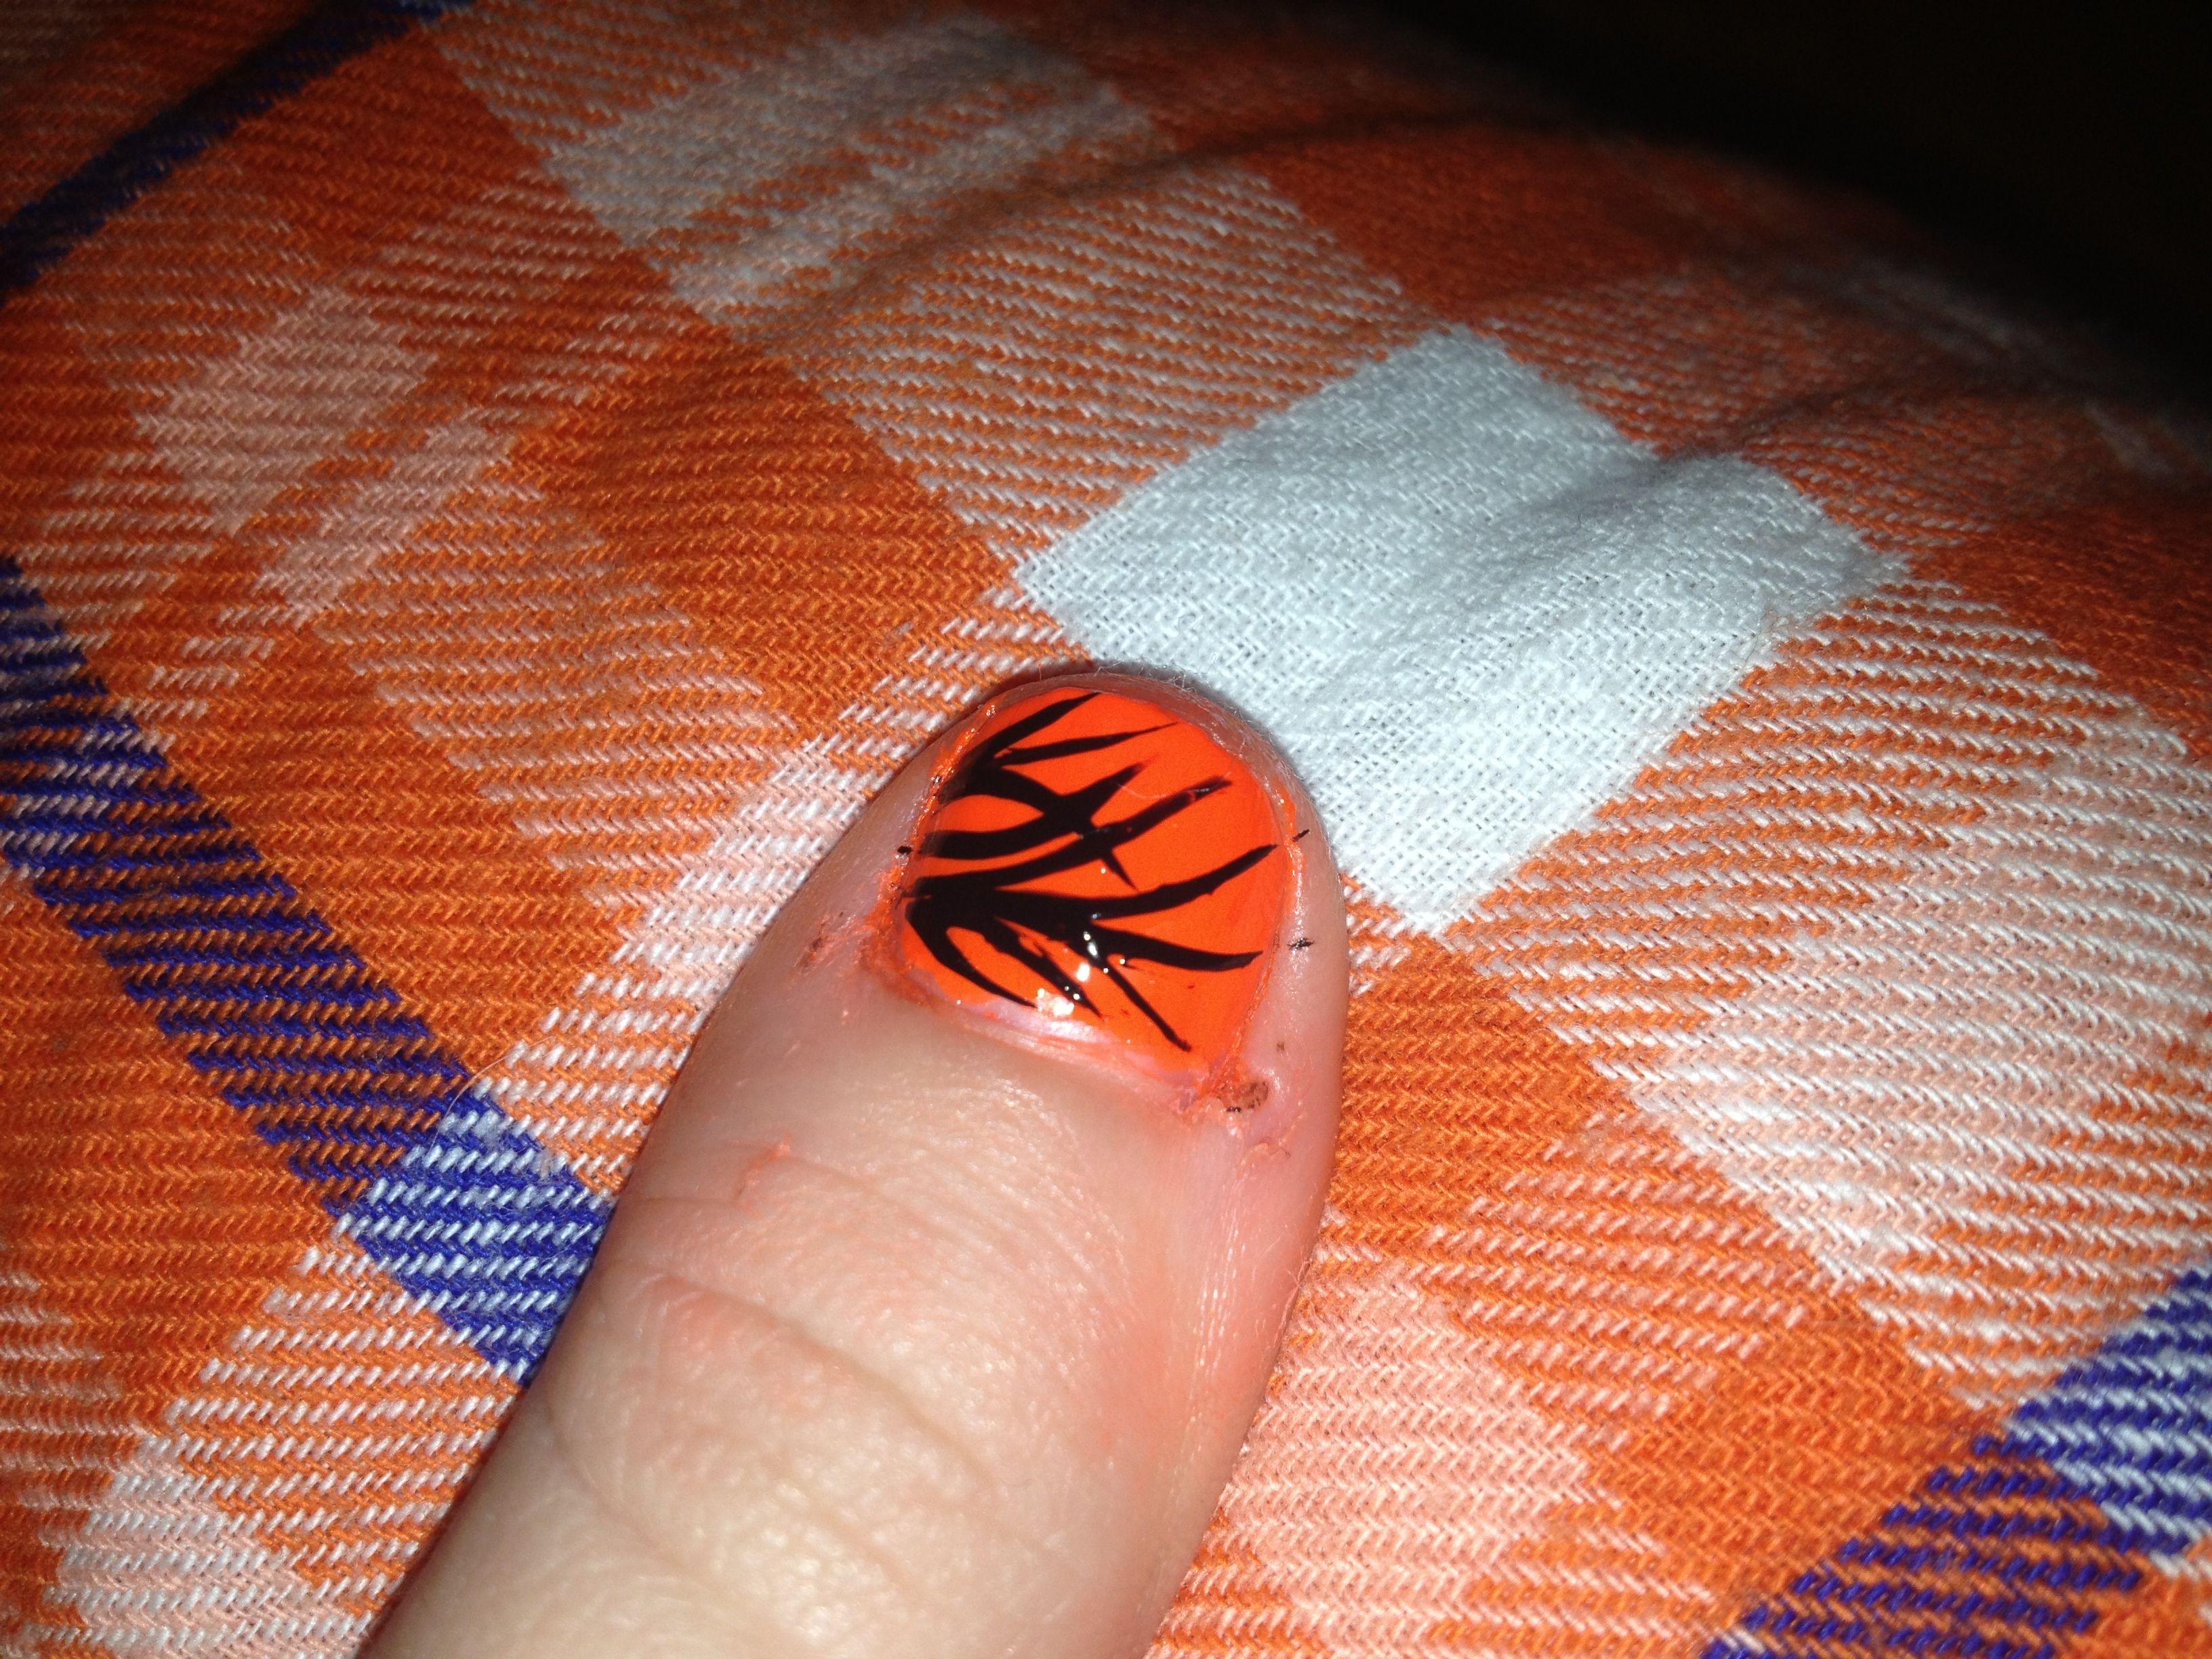 Black and orange nails